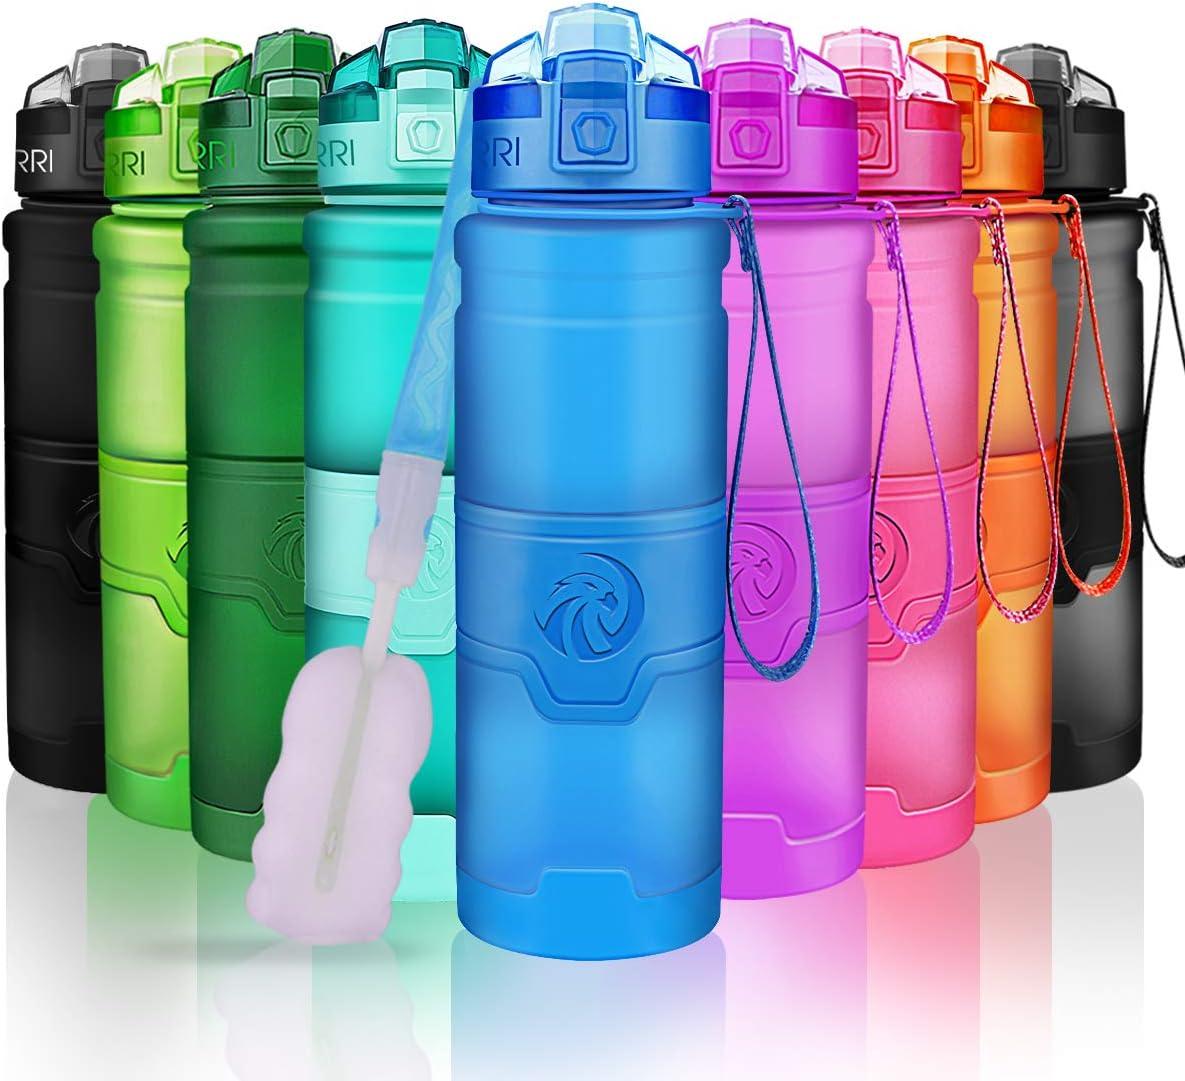 ZORRI Botella de Agua Deportiva-400ml/500ml/700ml/1000ml-sin BPA & a Prueba de Fugas, Reutilizable de plastico tritan, Agua Botellas Ideal con Filtro para niños Adulto,1-Click Apertura